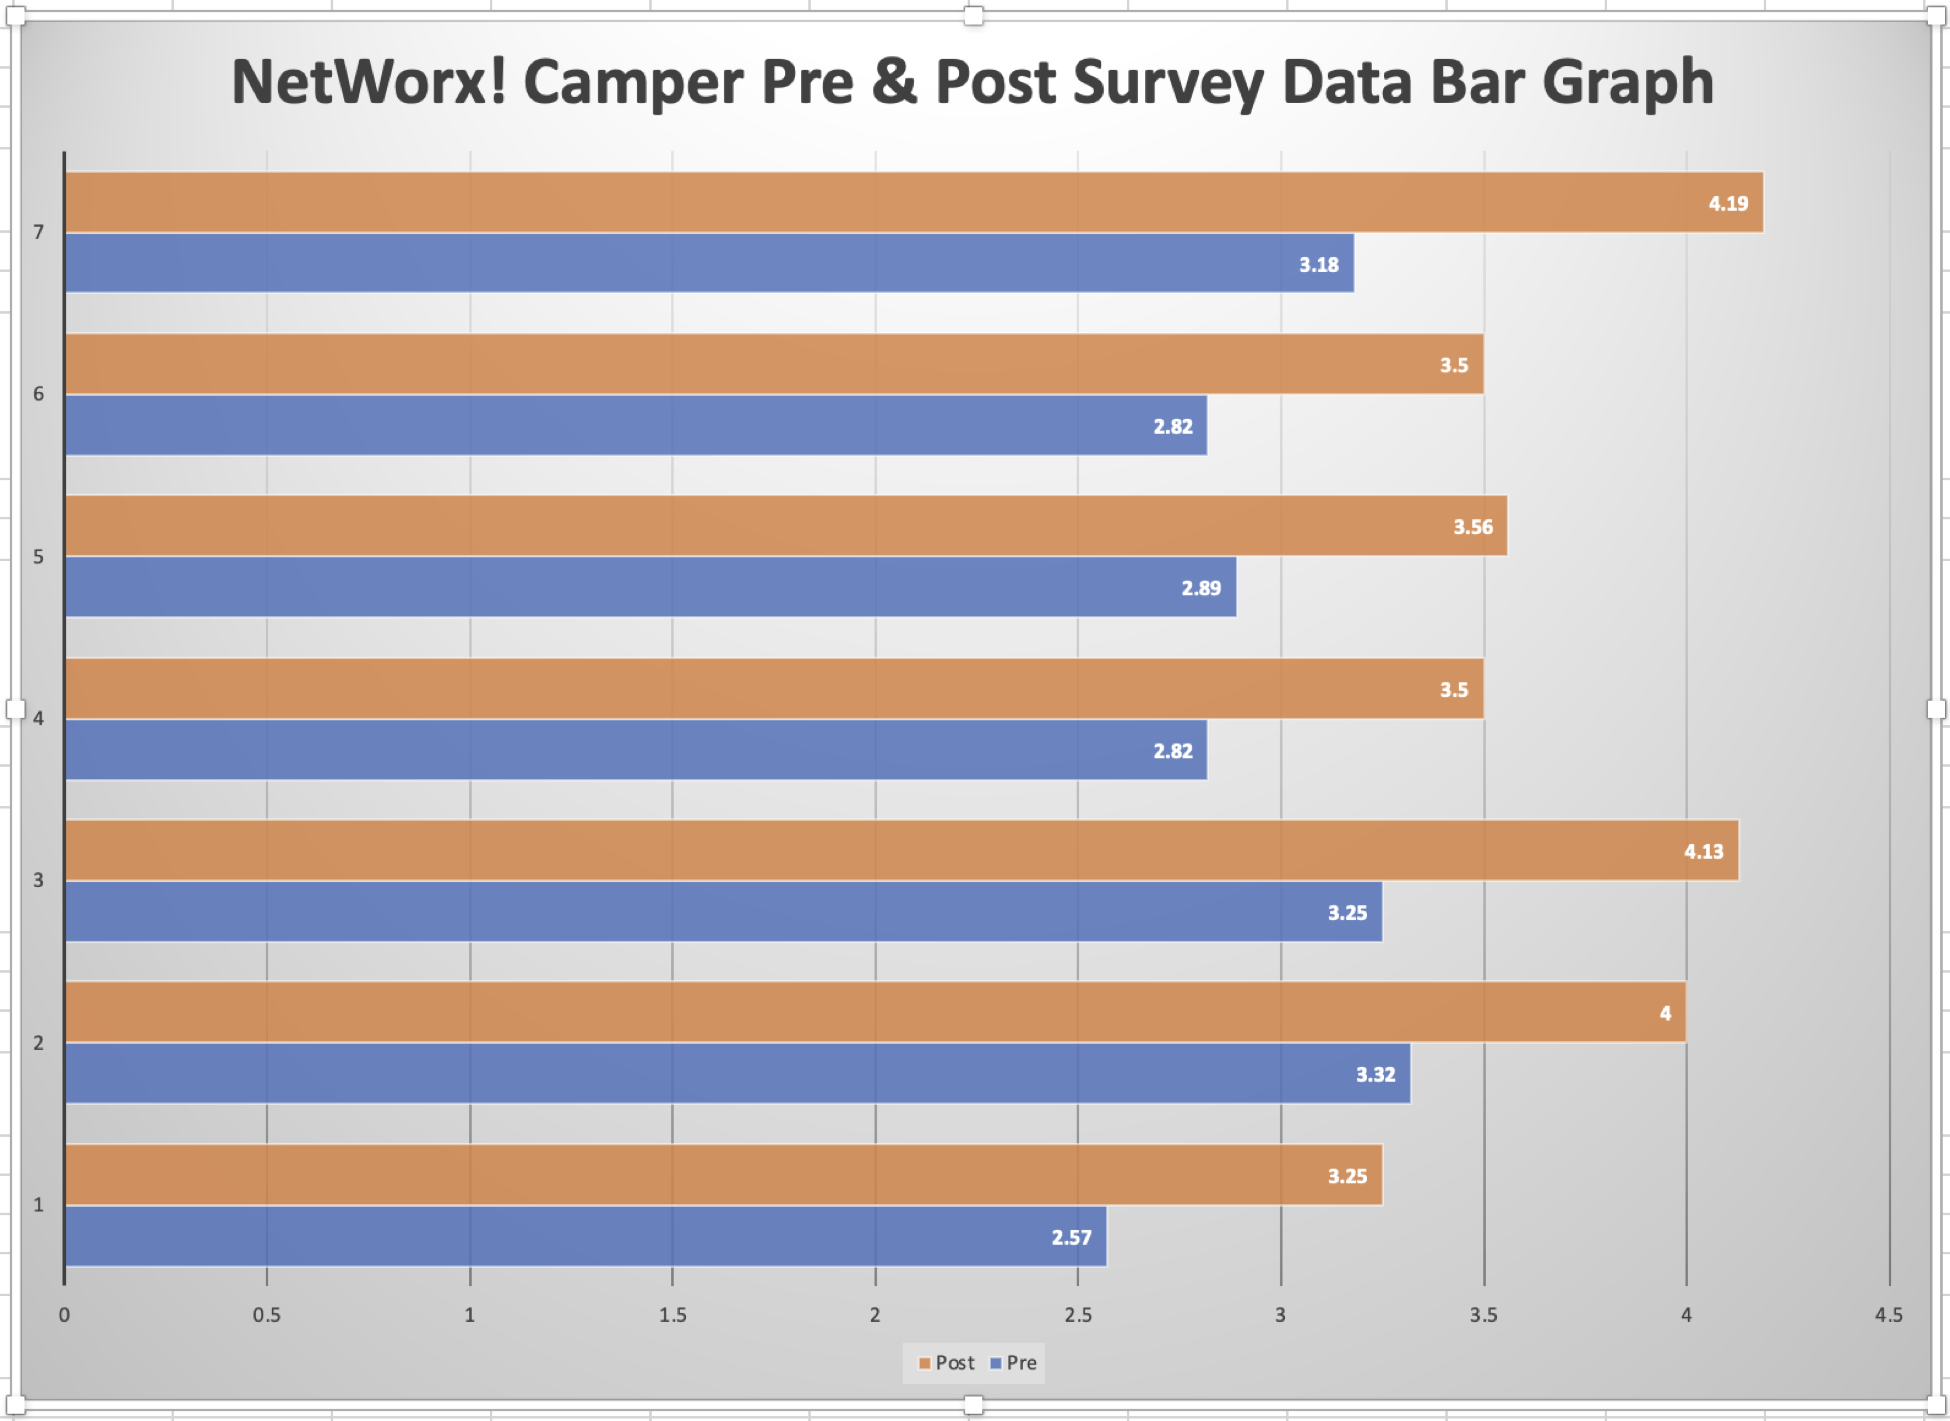 A bar graph representing seven questions of pre and post surveys.  Survey question 1 has a pre-survey average of 2.57 and a post-survey average of 3.25.  Survey question 2 has a pre-survey average of 3.32 and a post-survey average of 4.00.  Survey question 3 has a pre-survey average of 3.25 and a post-survey average of 4.13.  Survey question 4 has a pre-survey average of 2.82 and a post-survey average of 3.50.  Survey question 5 has a pre-survey average of 2.89 and a post-survey average of 3.56.  Survey question 6 has a pre-survey average of 2.82 and a post-survey average of 3.50.  Survey question 7 has a pre-survey average of 3.18 and a post-survey average of 4.19.